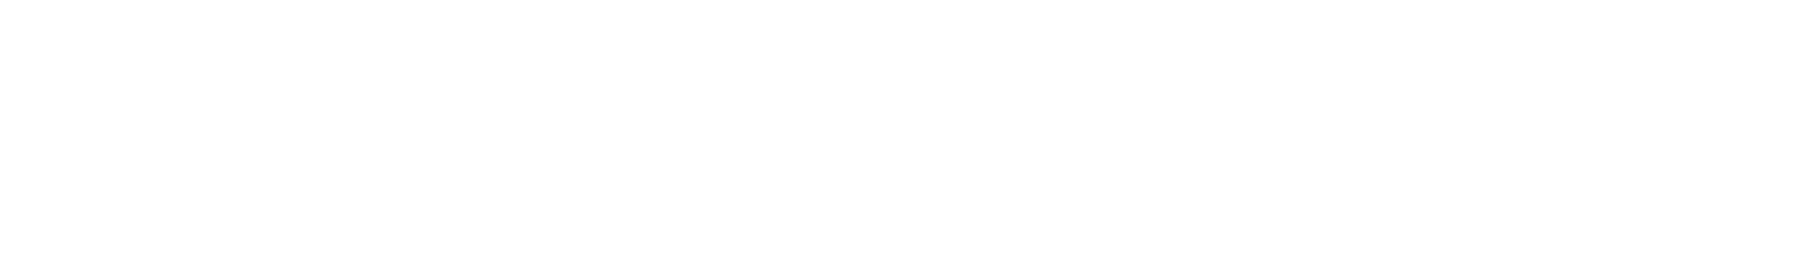 g abs05 060